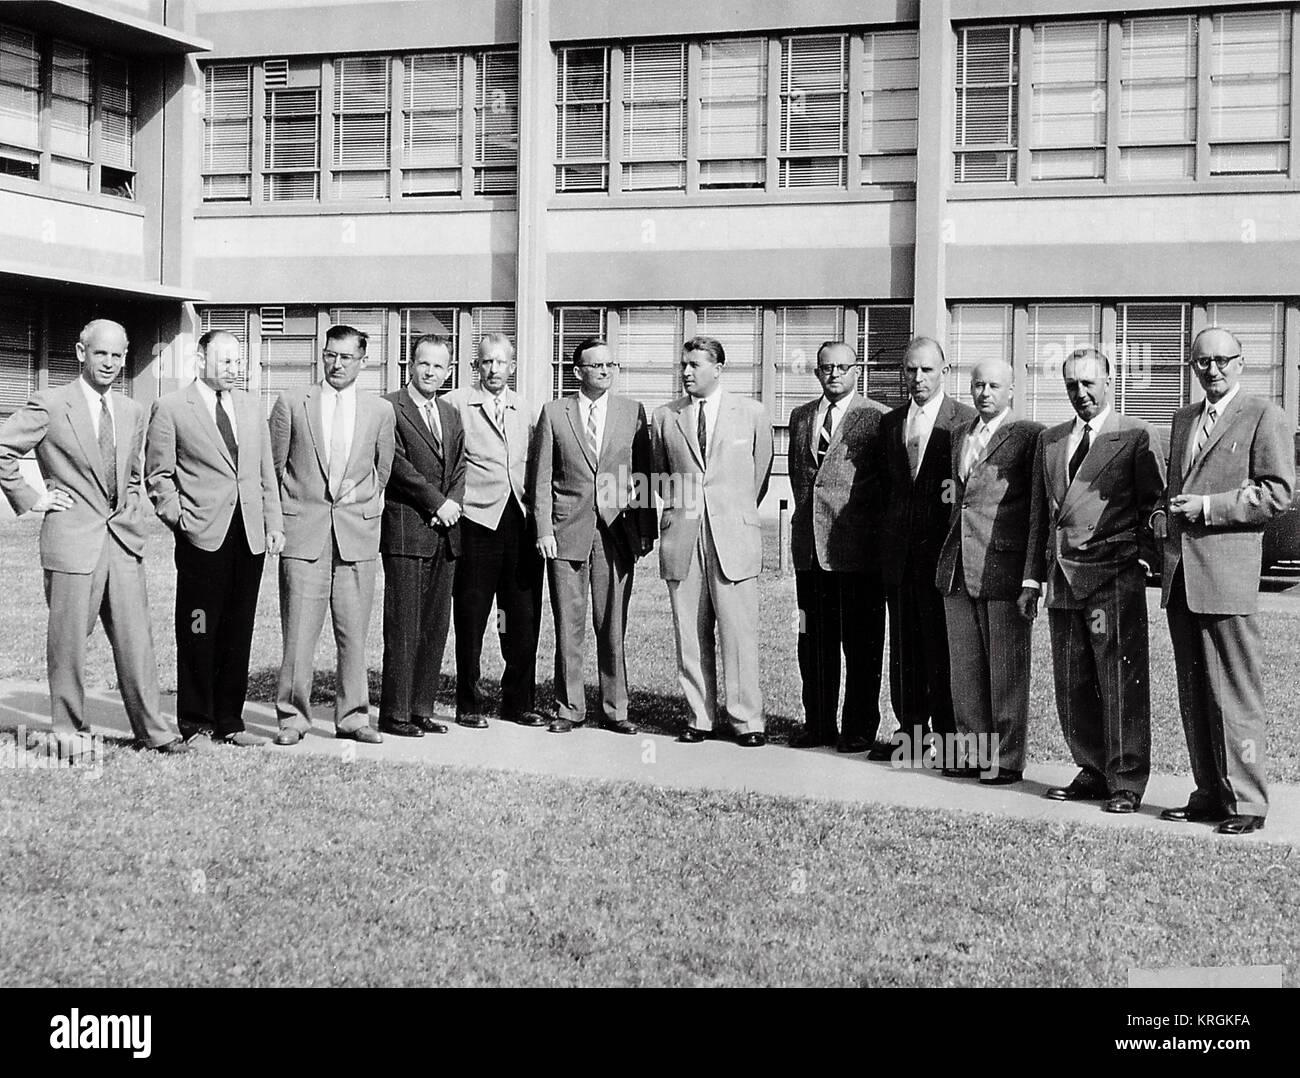 DR. VON BRAUN AND THE ORIGINAL GERMAN TEAM AT BLDG. 4488 LED ARMY'S SPACE EFFORTS AT ABMA BEFORE TRANSFER OF THE TEAM TO MSFC. (L. TO R.) DR. ERNST STUHLINGER, DR. HELMET HOELZER, KARL L. HEIMBURG, DR. ERNST GEISSLER, ERICH W. NEUBERT, DR. WERNHER VON BRAUN, WILLIAM A. MRAZEK, HANS HEUTER, EBERHARD REES, DR. KURT DEBUS, AND HANS H. MAUS. Twelve Scientific Specialists of the Peenemuende Team Stock Photo